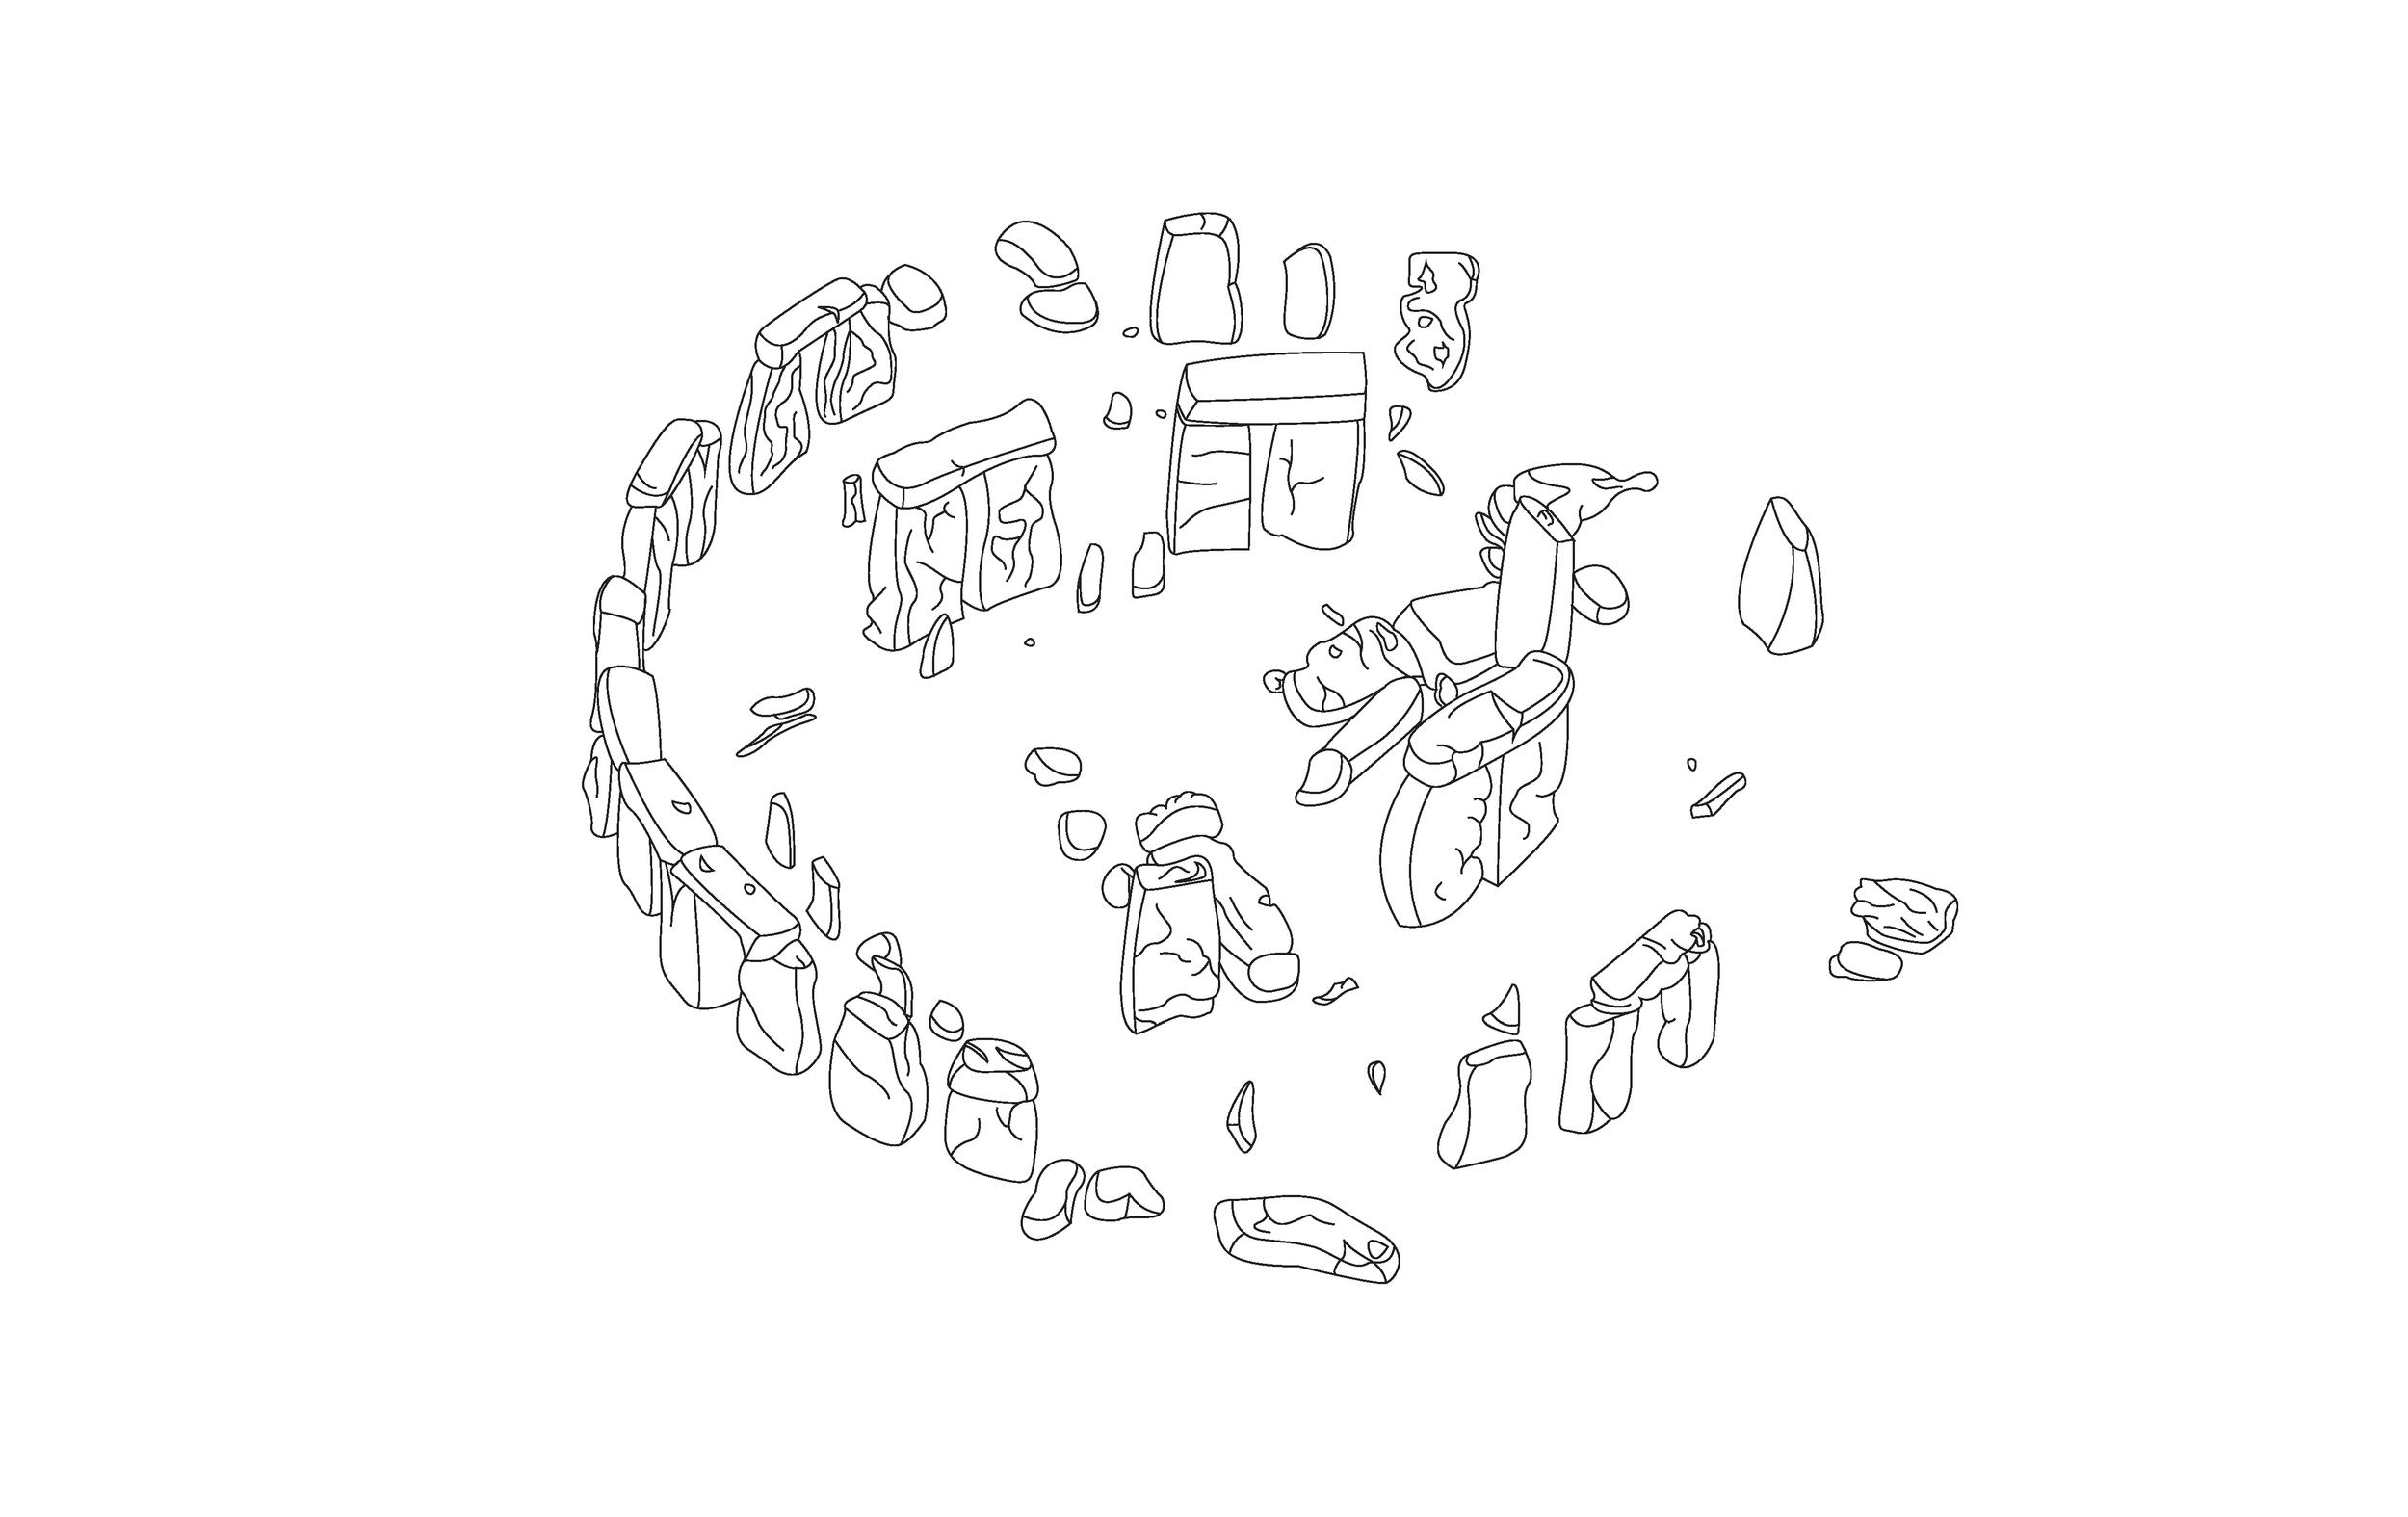 stonehenge_united_kingdom3.png